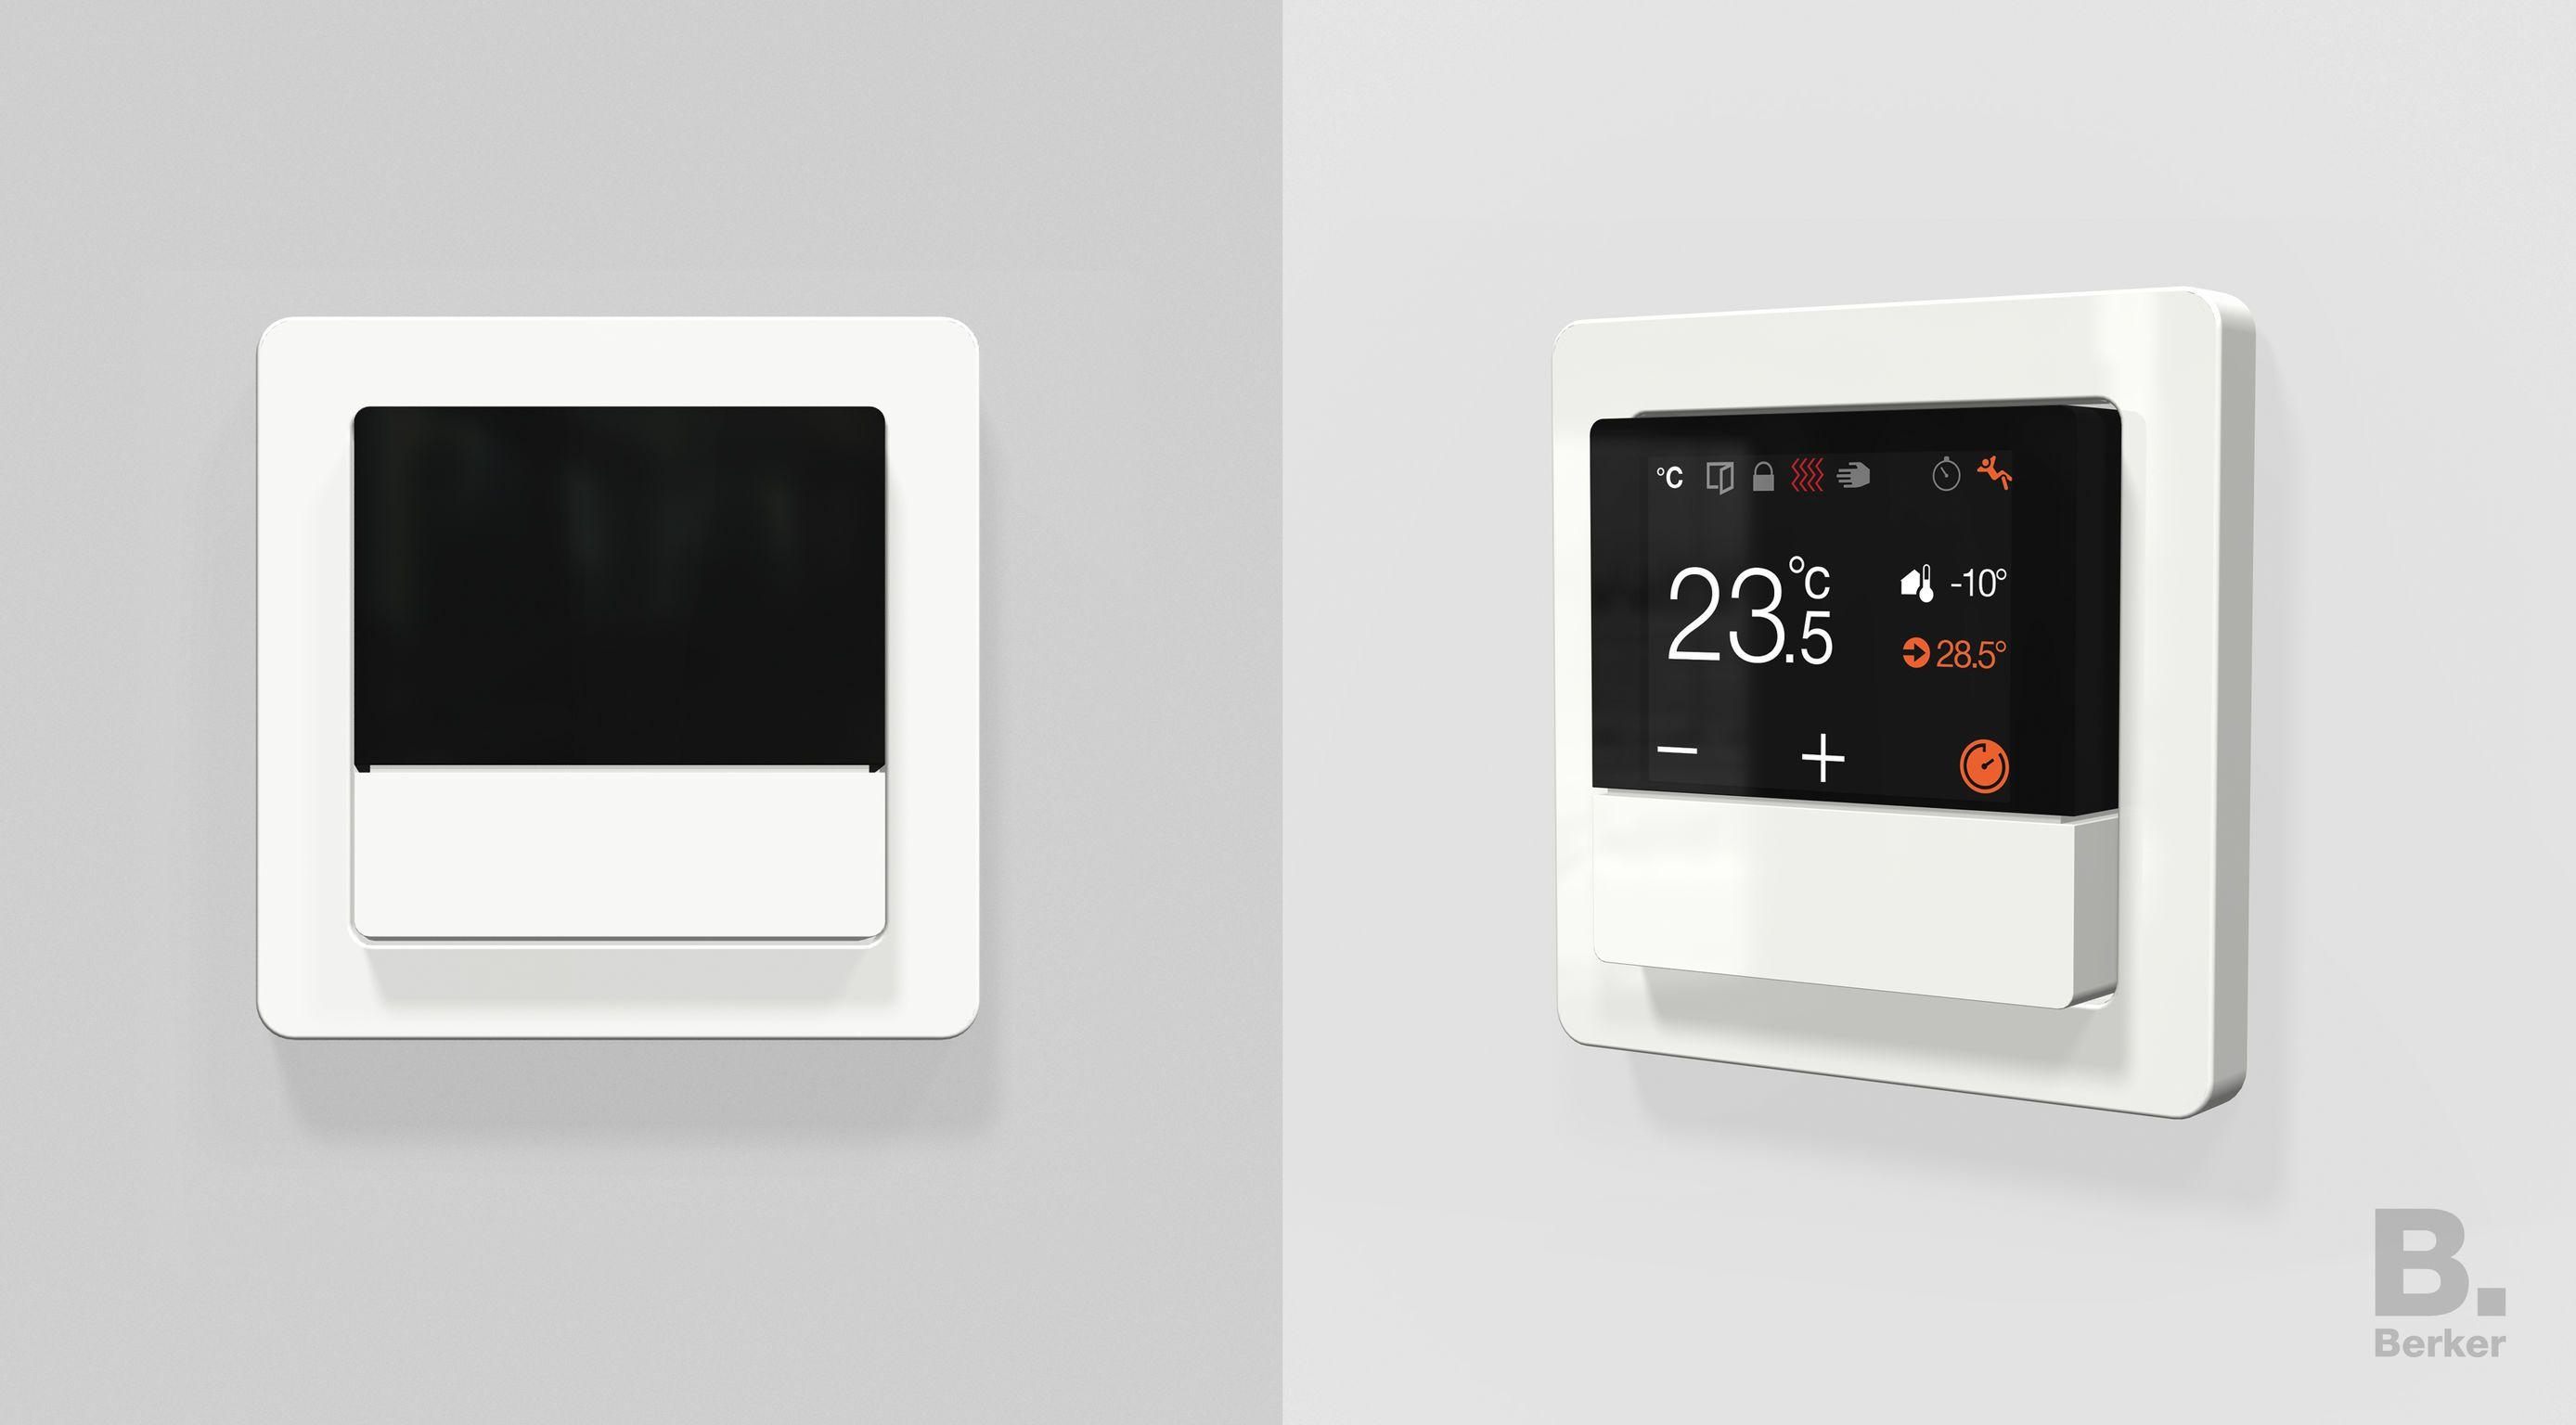 Berker Knx Raumcontroller Iot Design Home Automation Devices Design